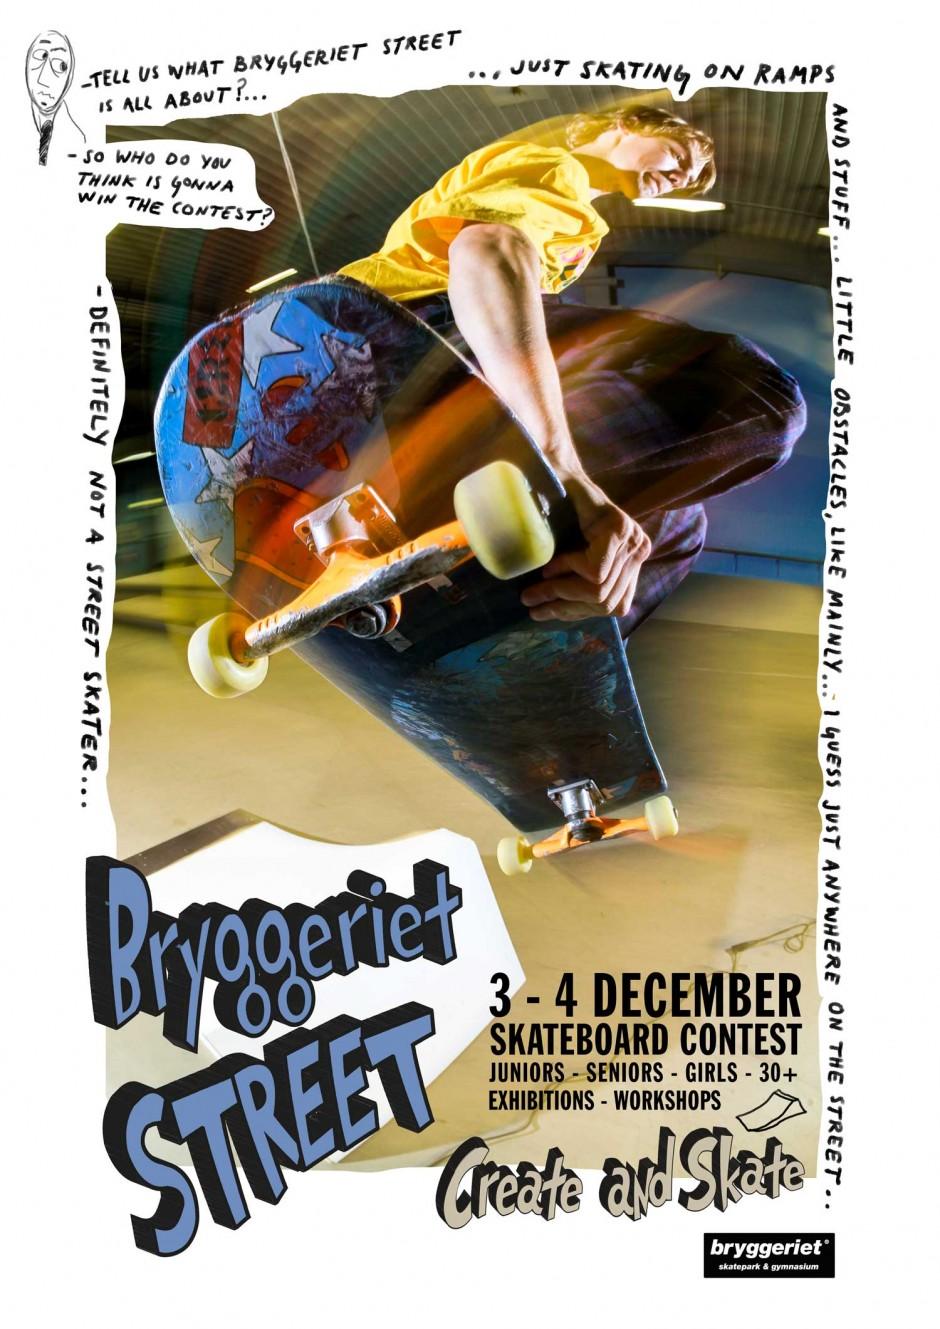 Bryggeriet-Street-2016-poster_web